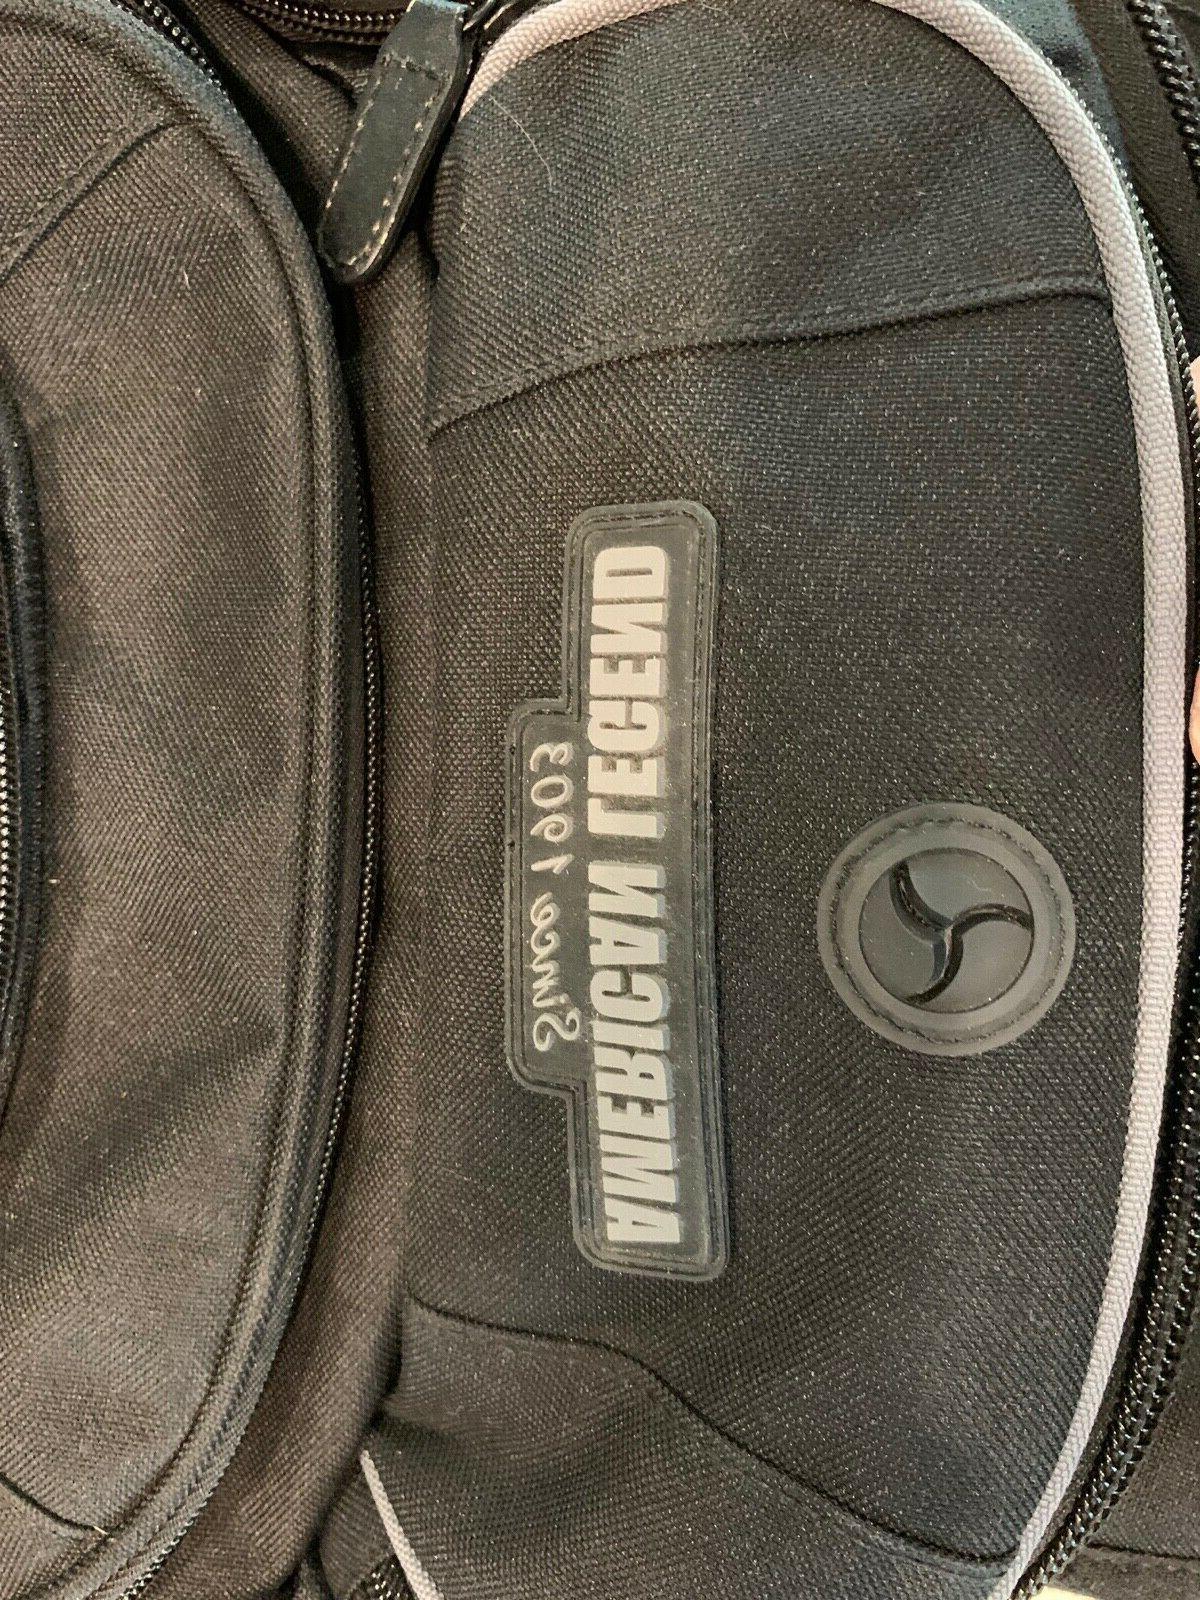 Harley-Davidson Deluxe Black & Gray Backpack